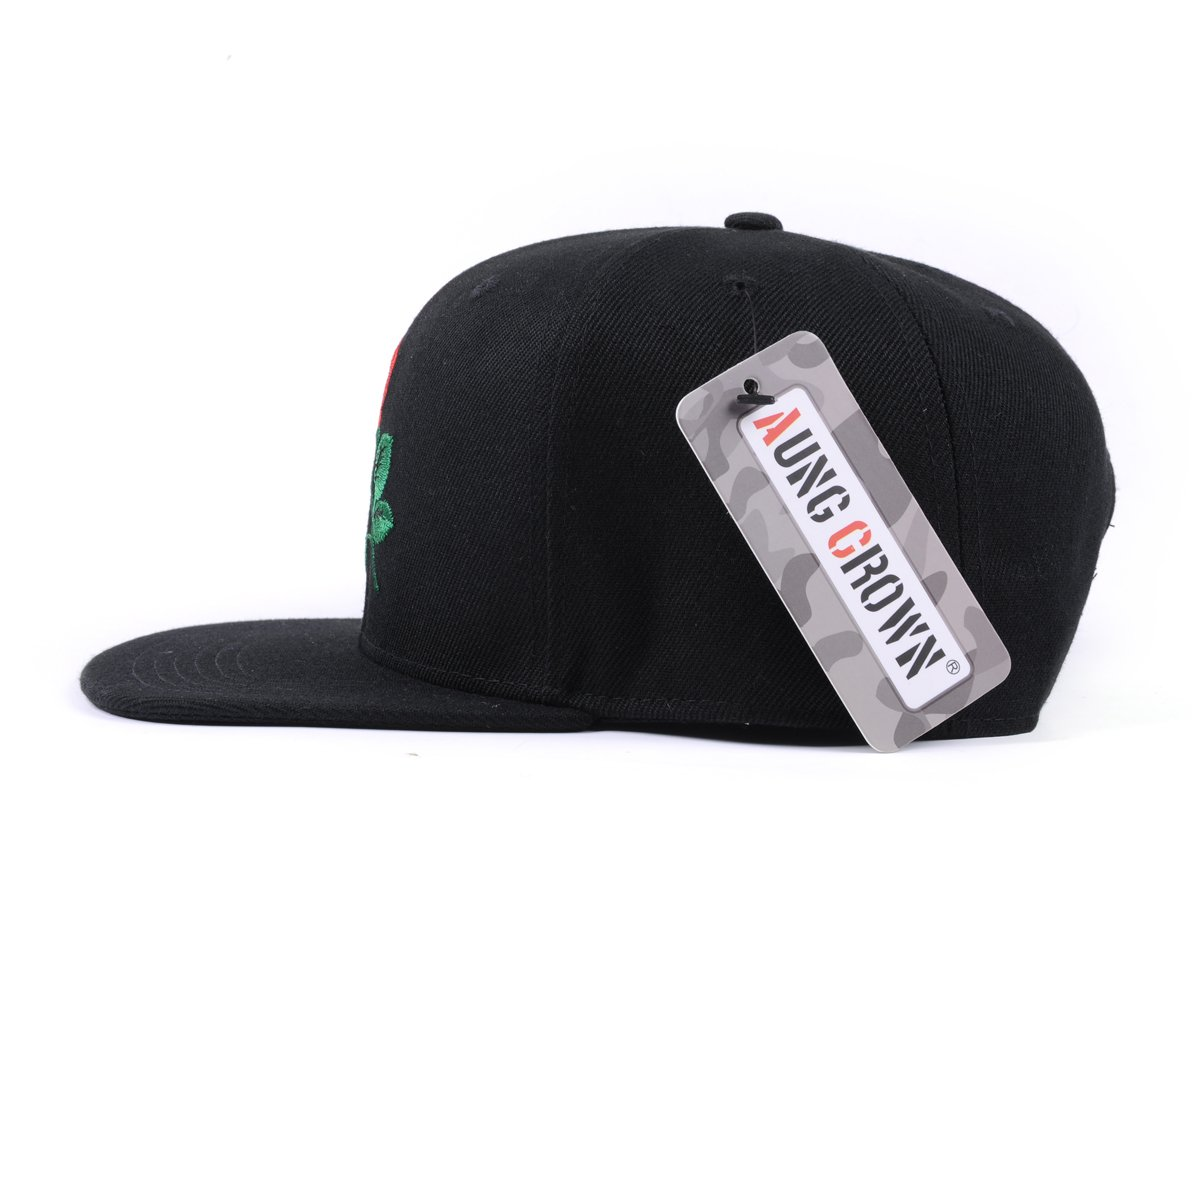 e8807fa4e15 AUNG CROWN Rose Embroider Flat Bill Snapback Hats Women Men Snap Back Caps  Black at Amazon Women s Clothing store